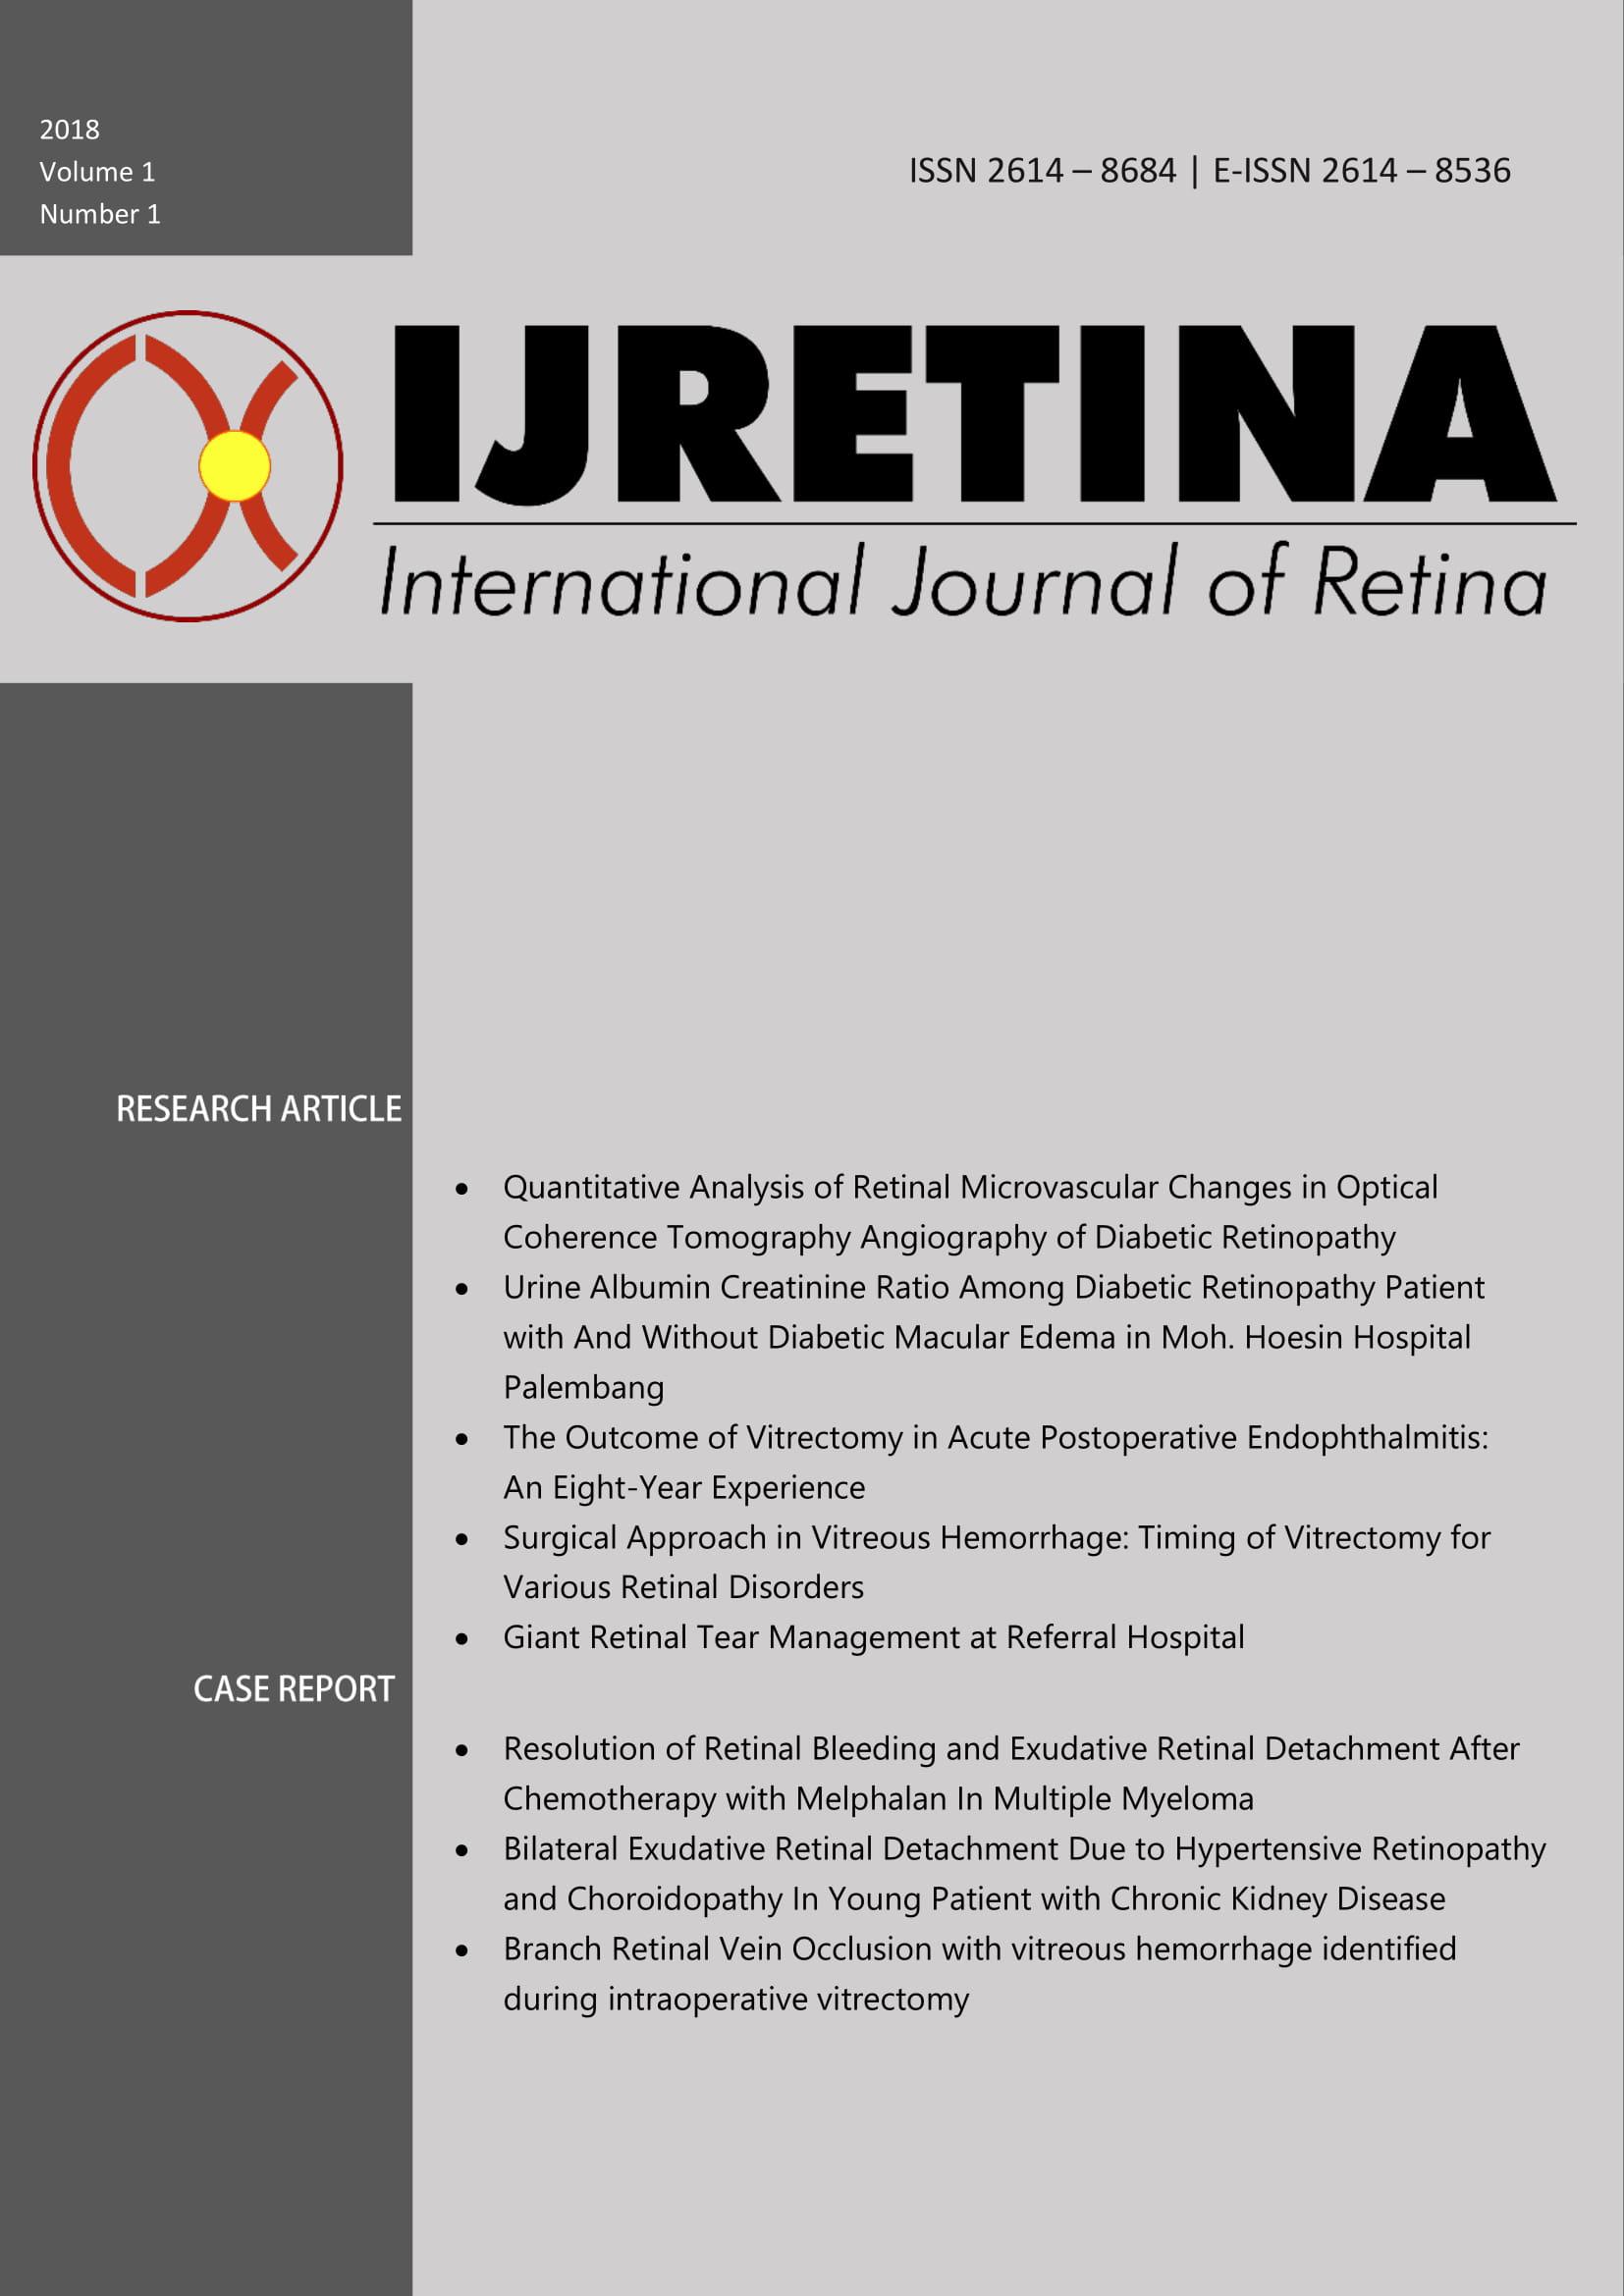 International Journal Of Retina Volume 1